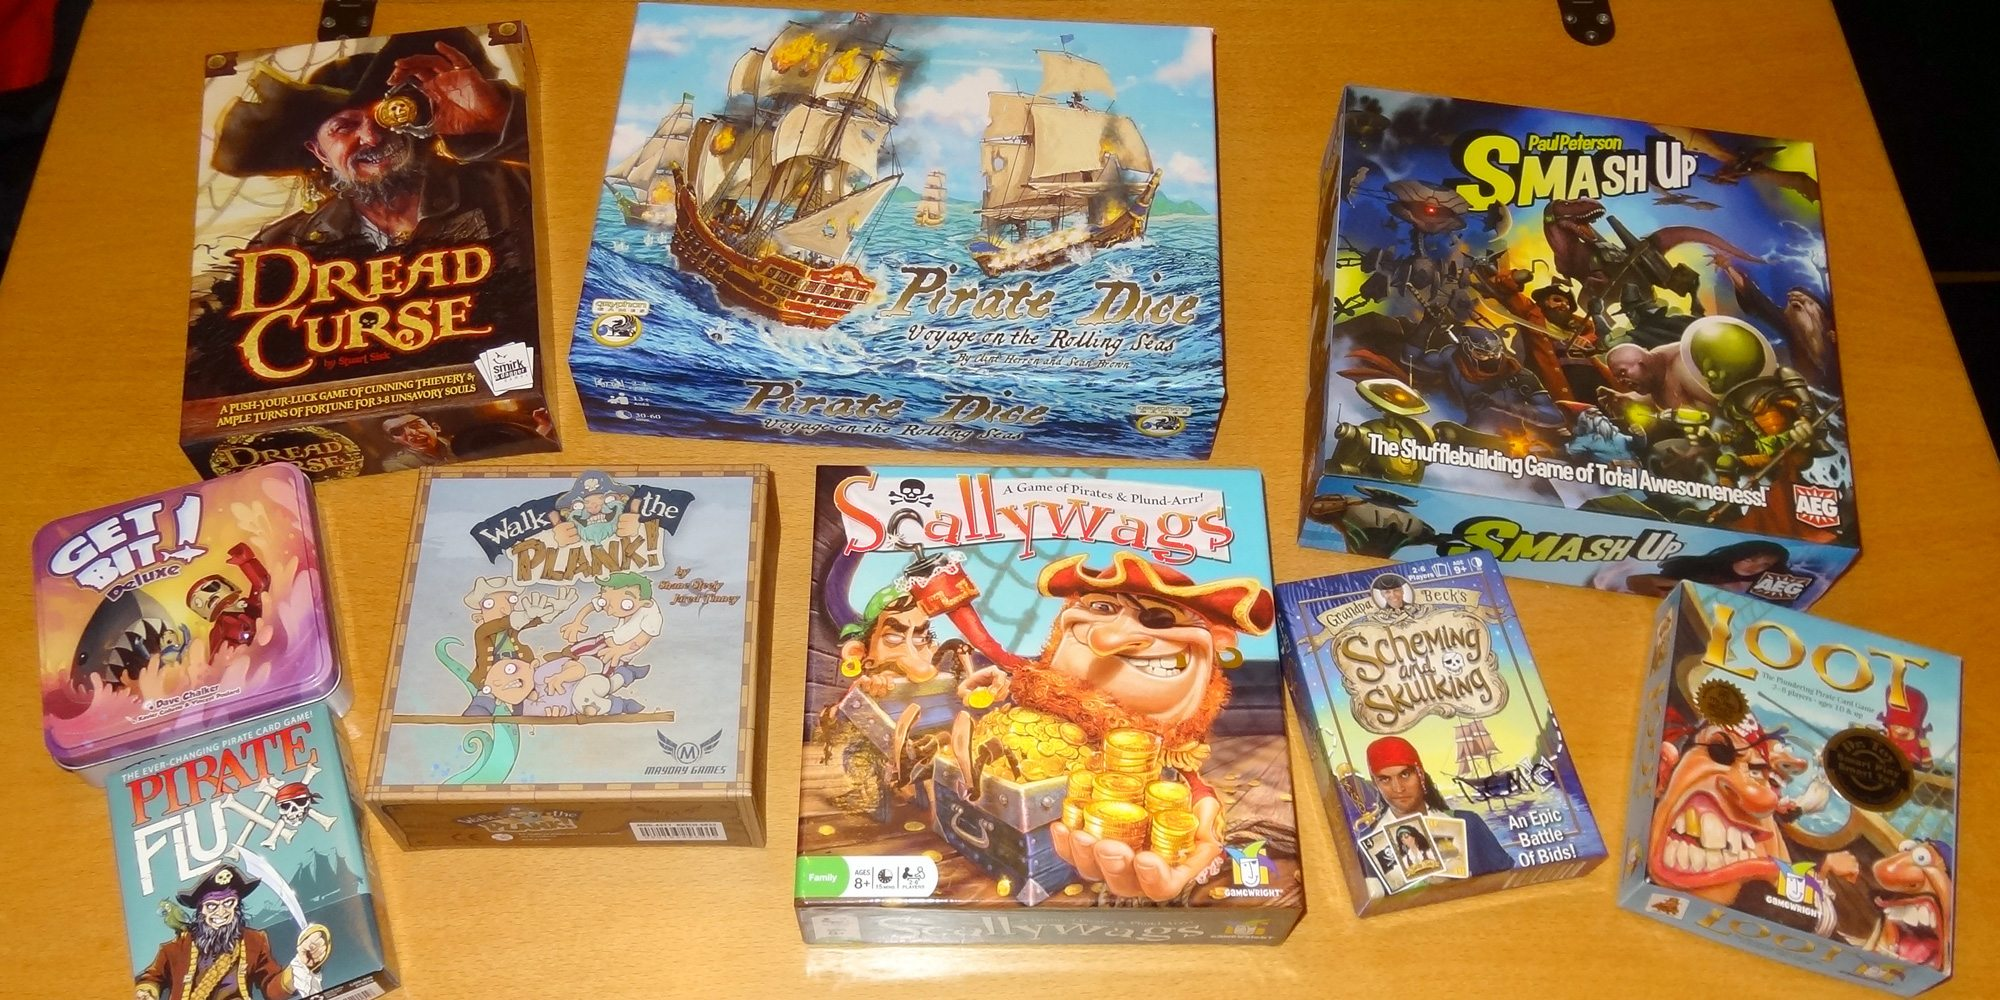 Game Like a Pirate